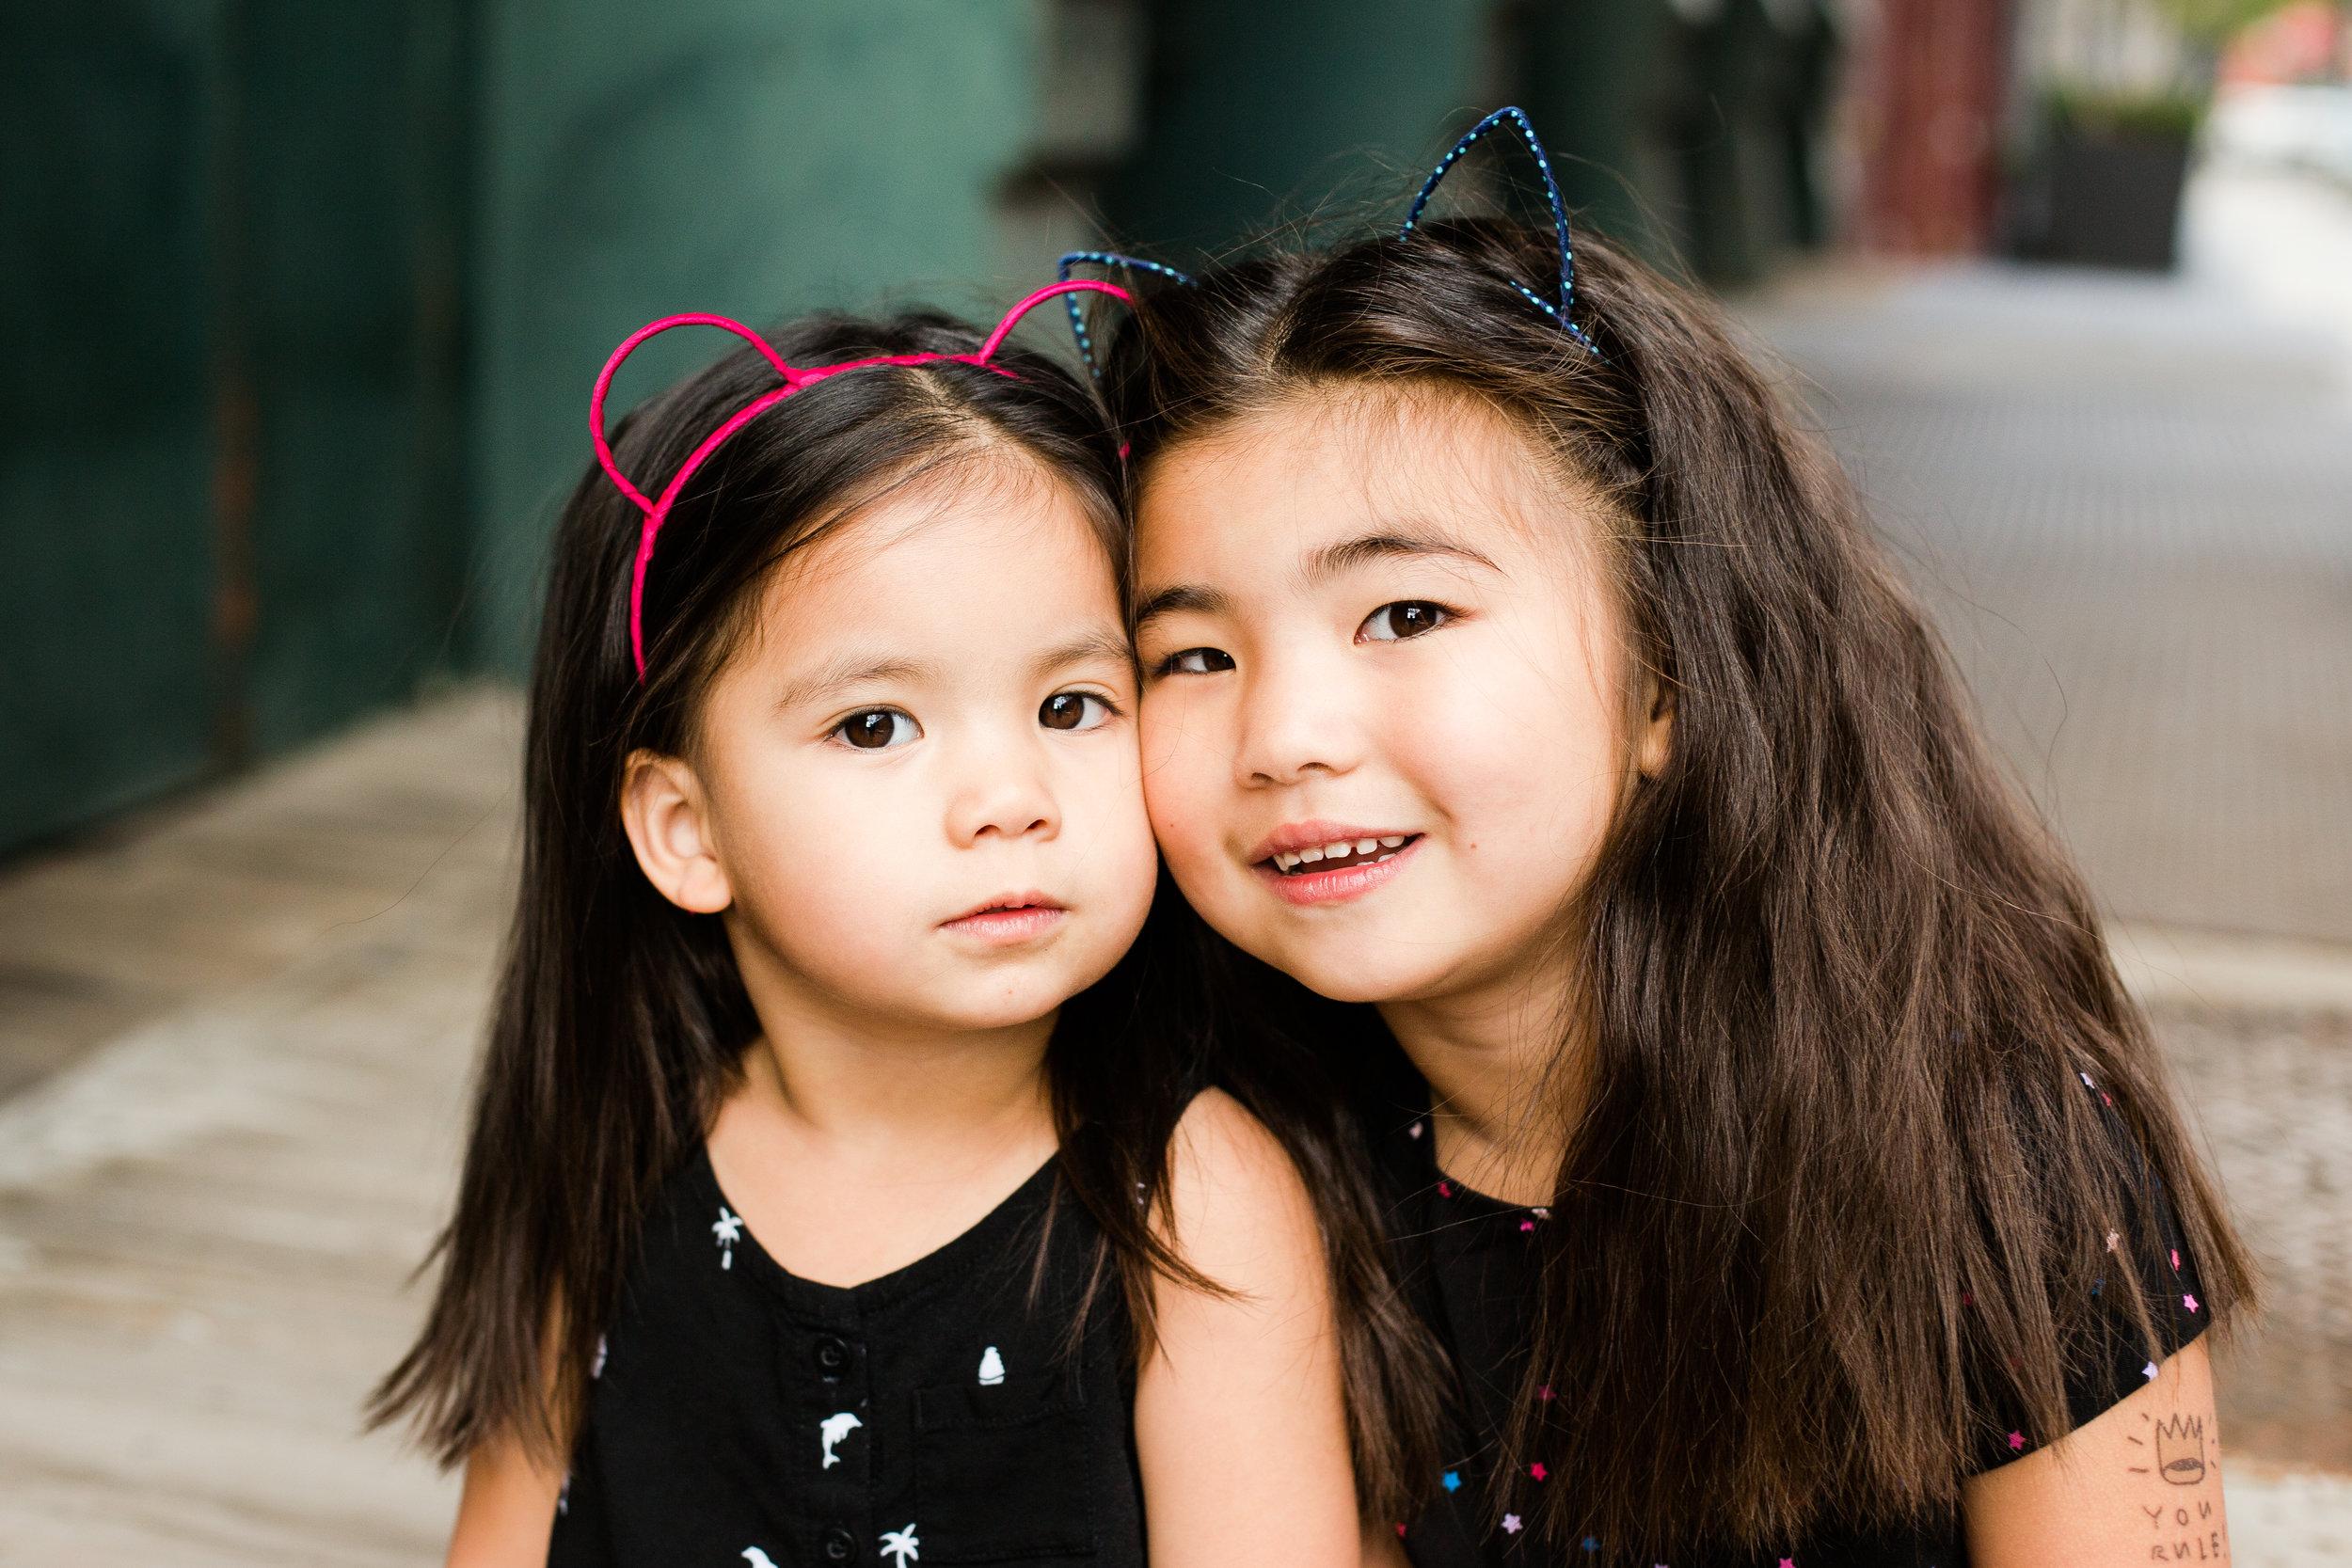 lissiephoto_loomis_nyc_family_photography28.JPG